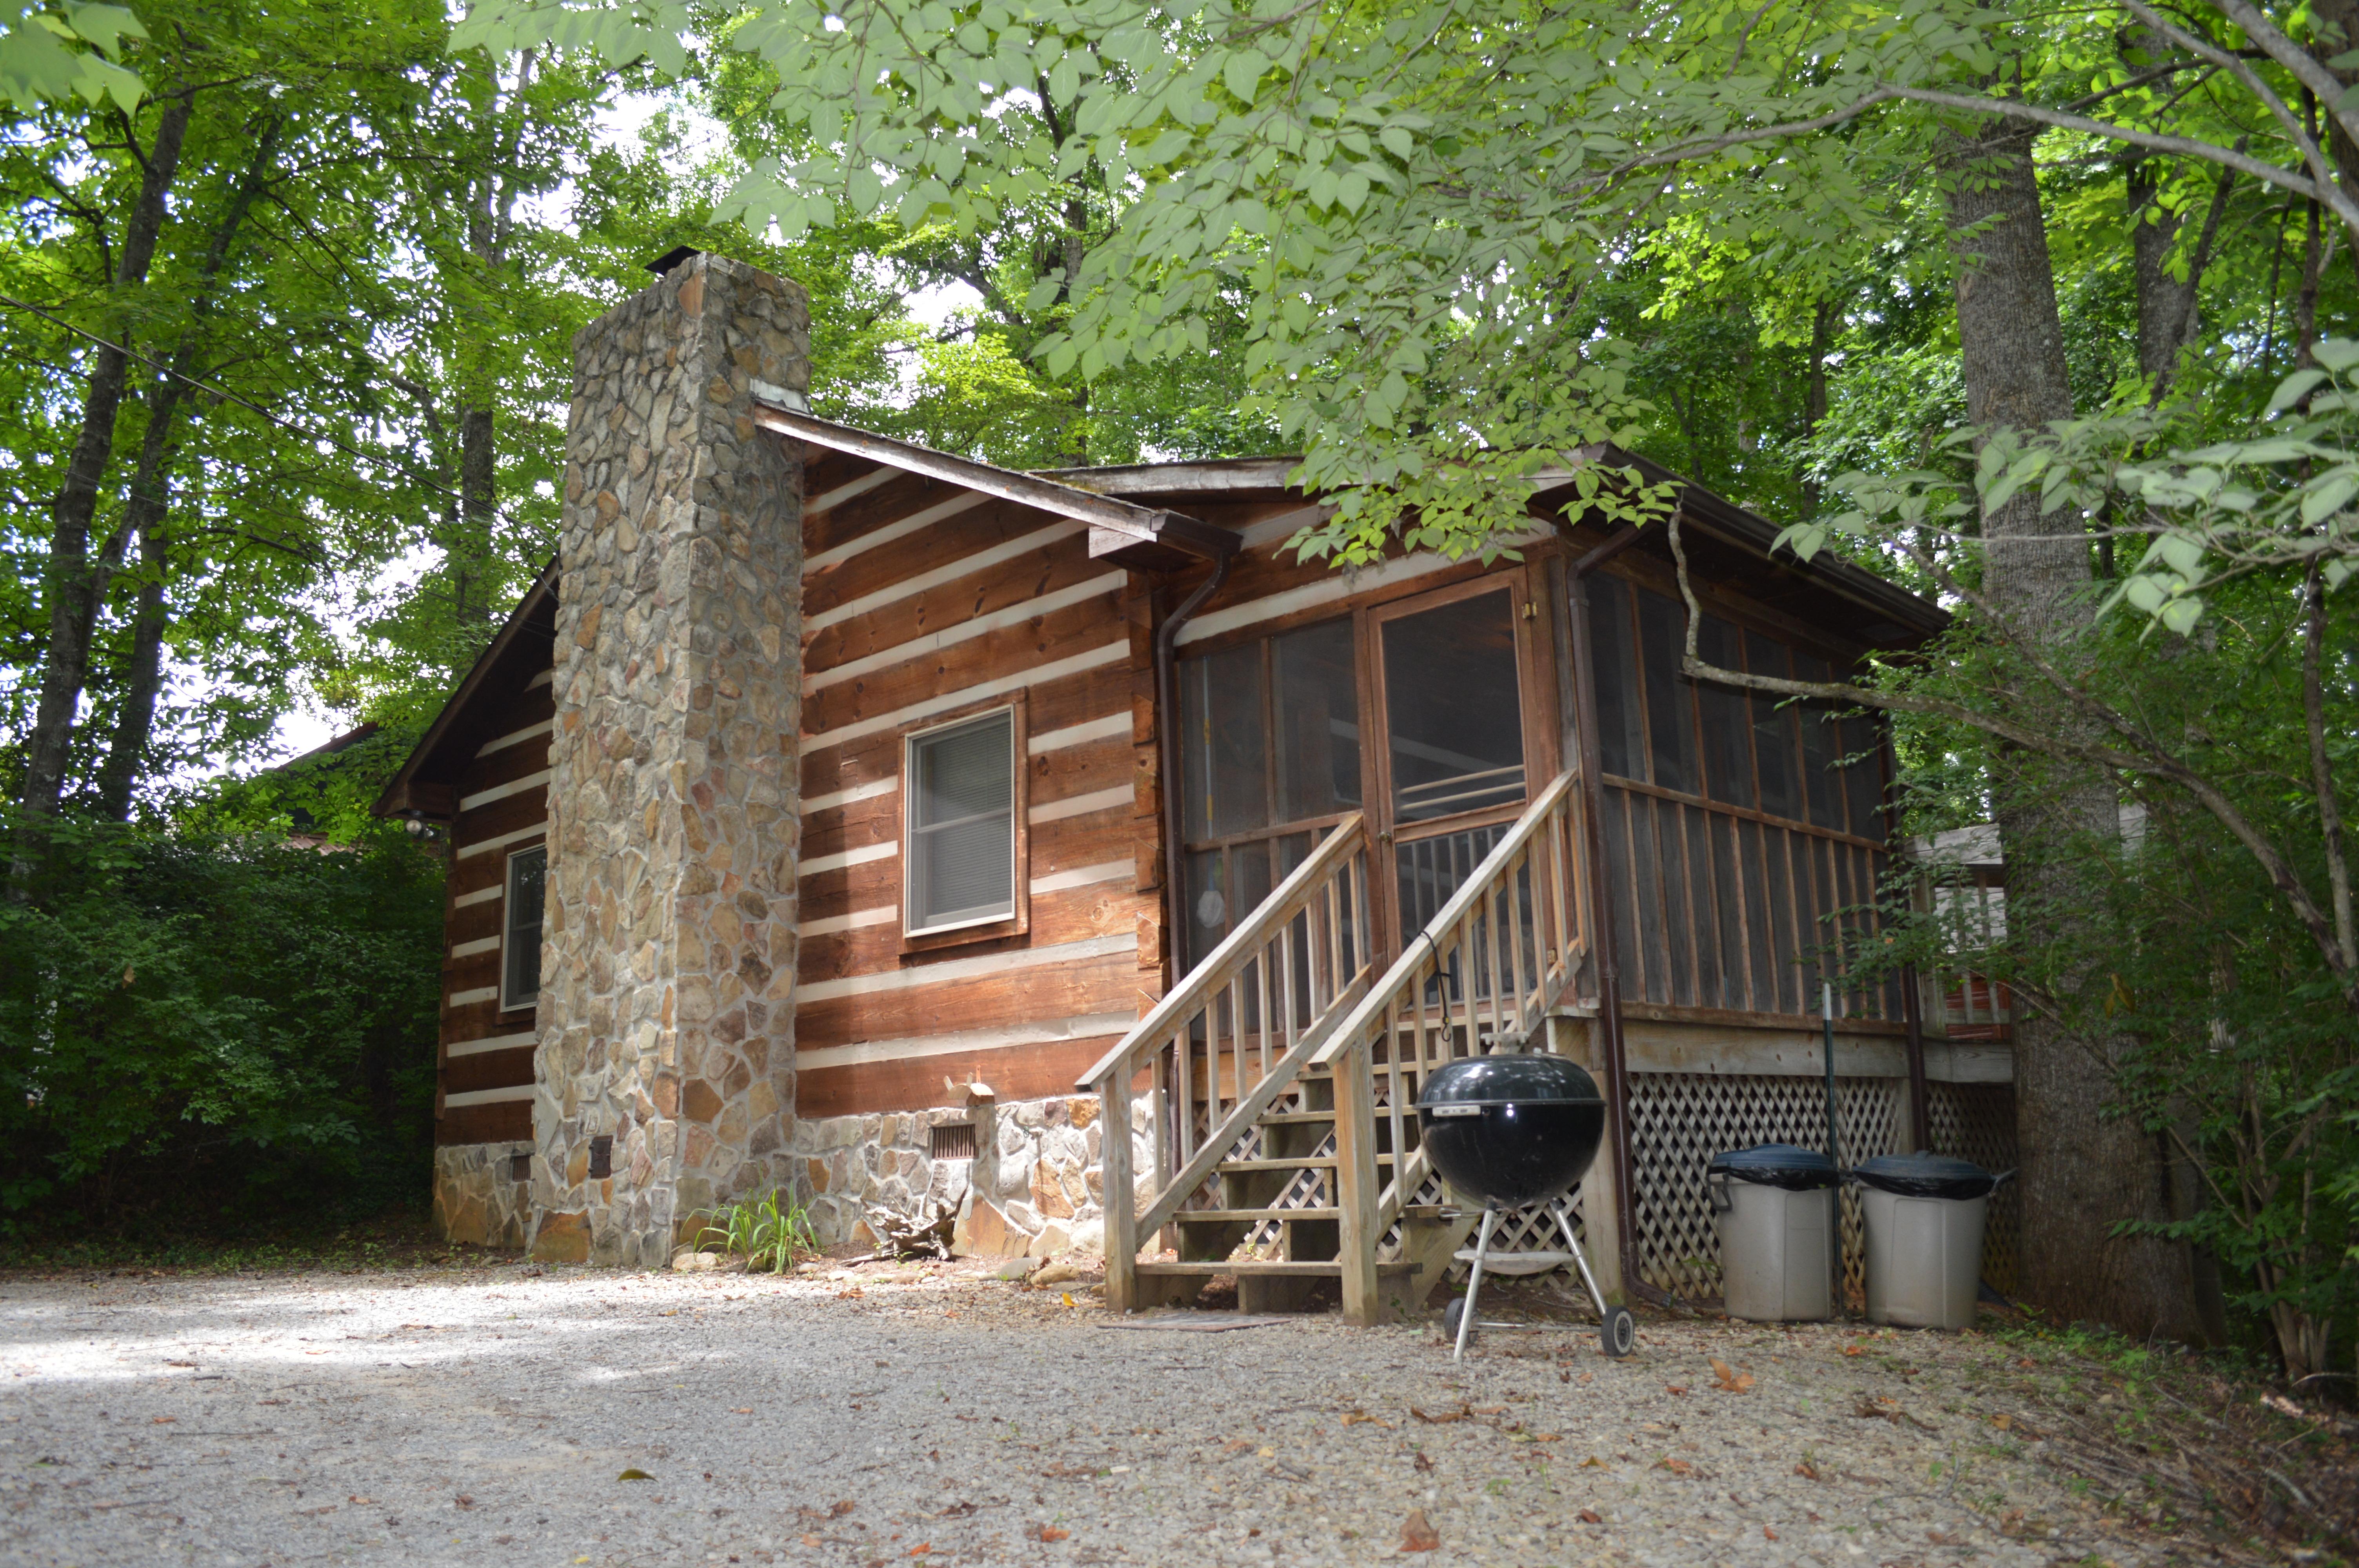 Townsend log cabin near river tipton 39 s cabin rentals for Log cabins rentals